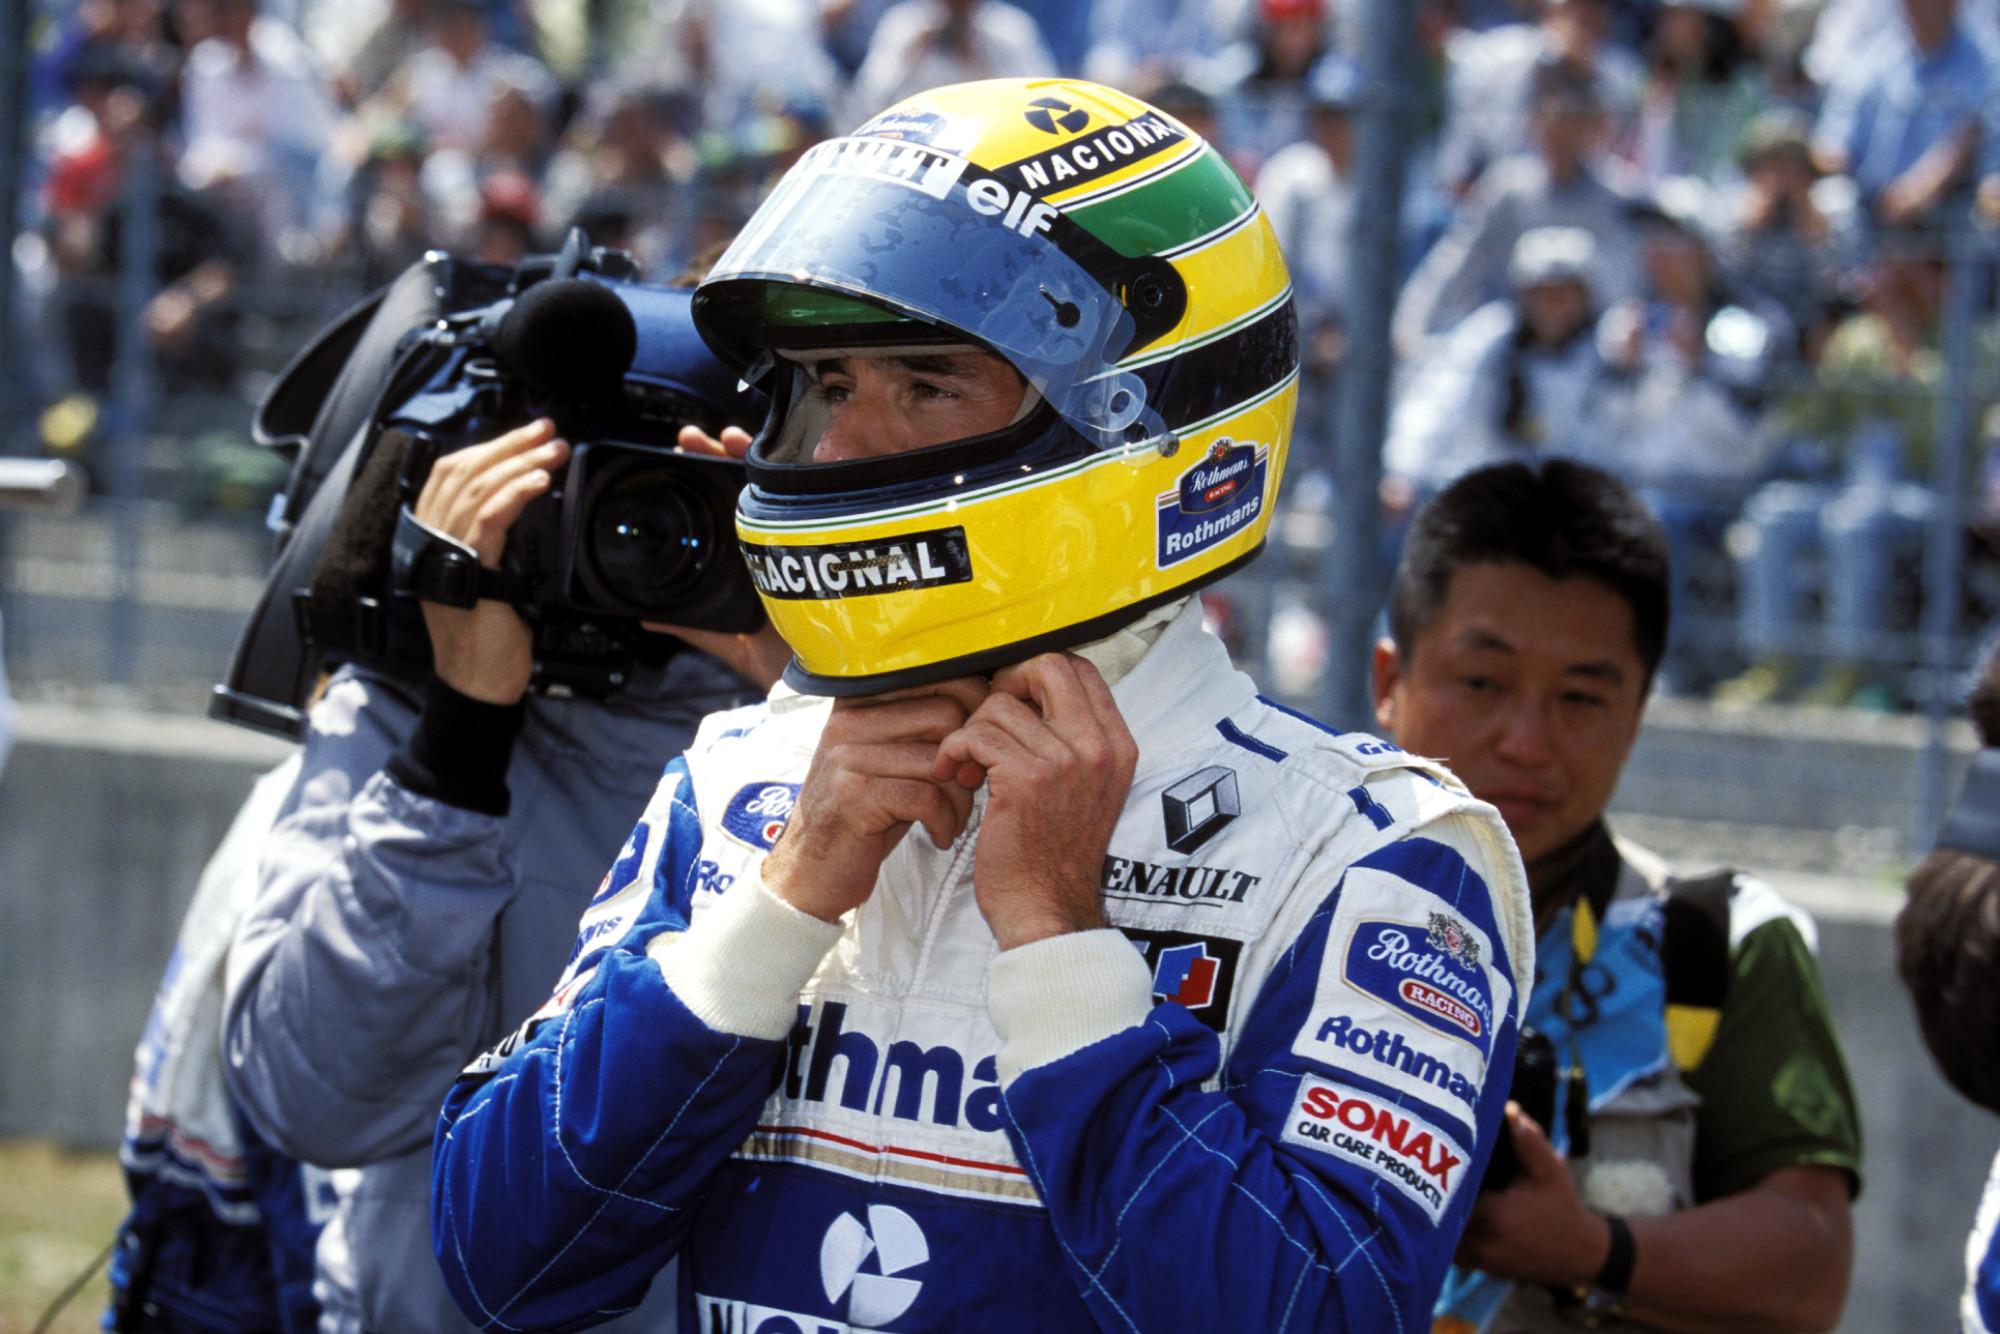 Ayrton Senna with Williams